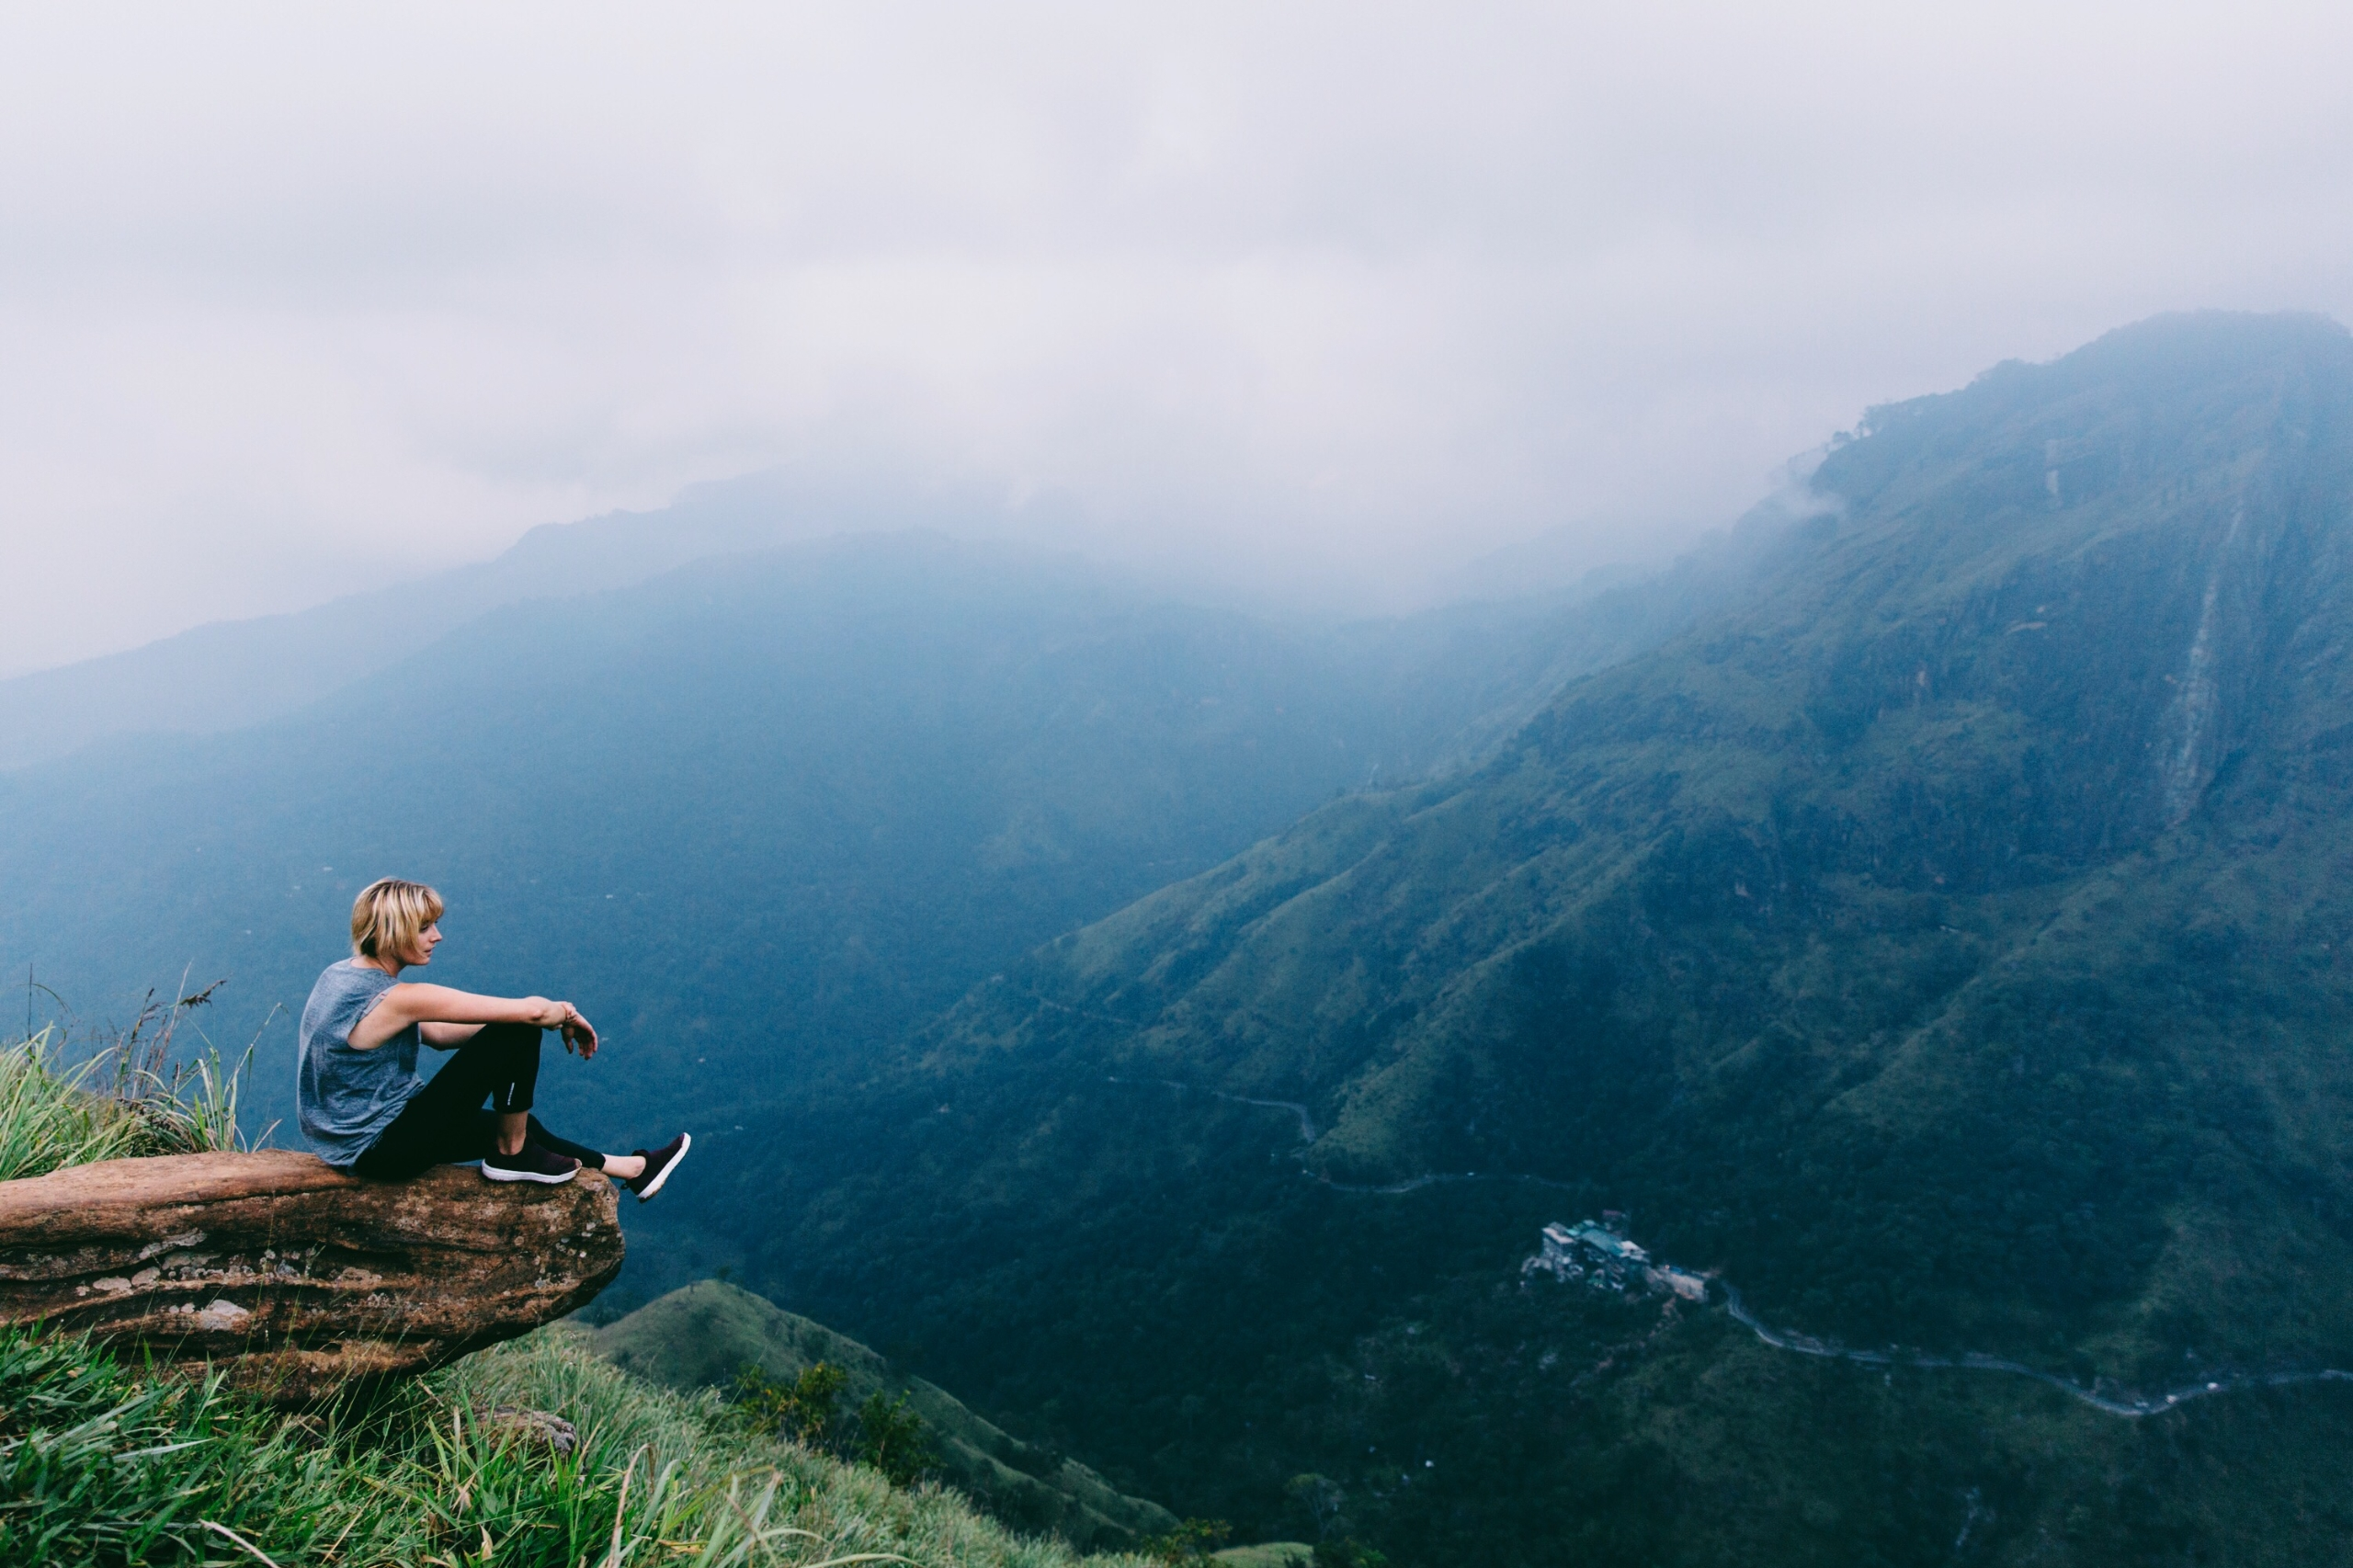 Sitting edge world. photos Sri  - lauraaustin | ello